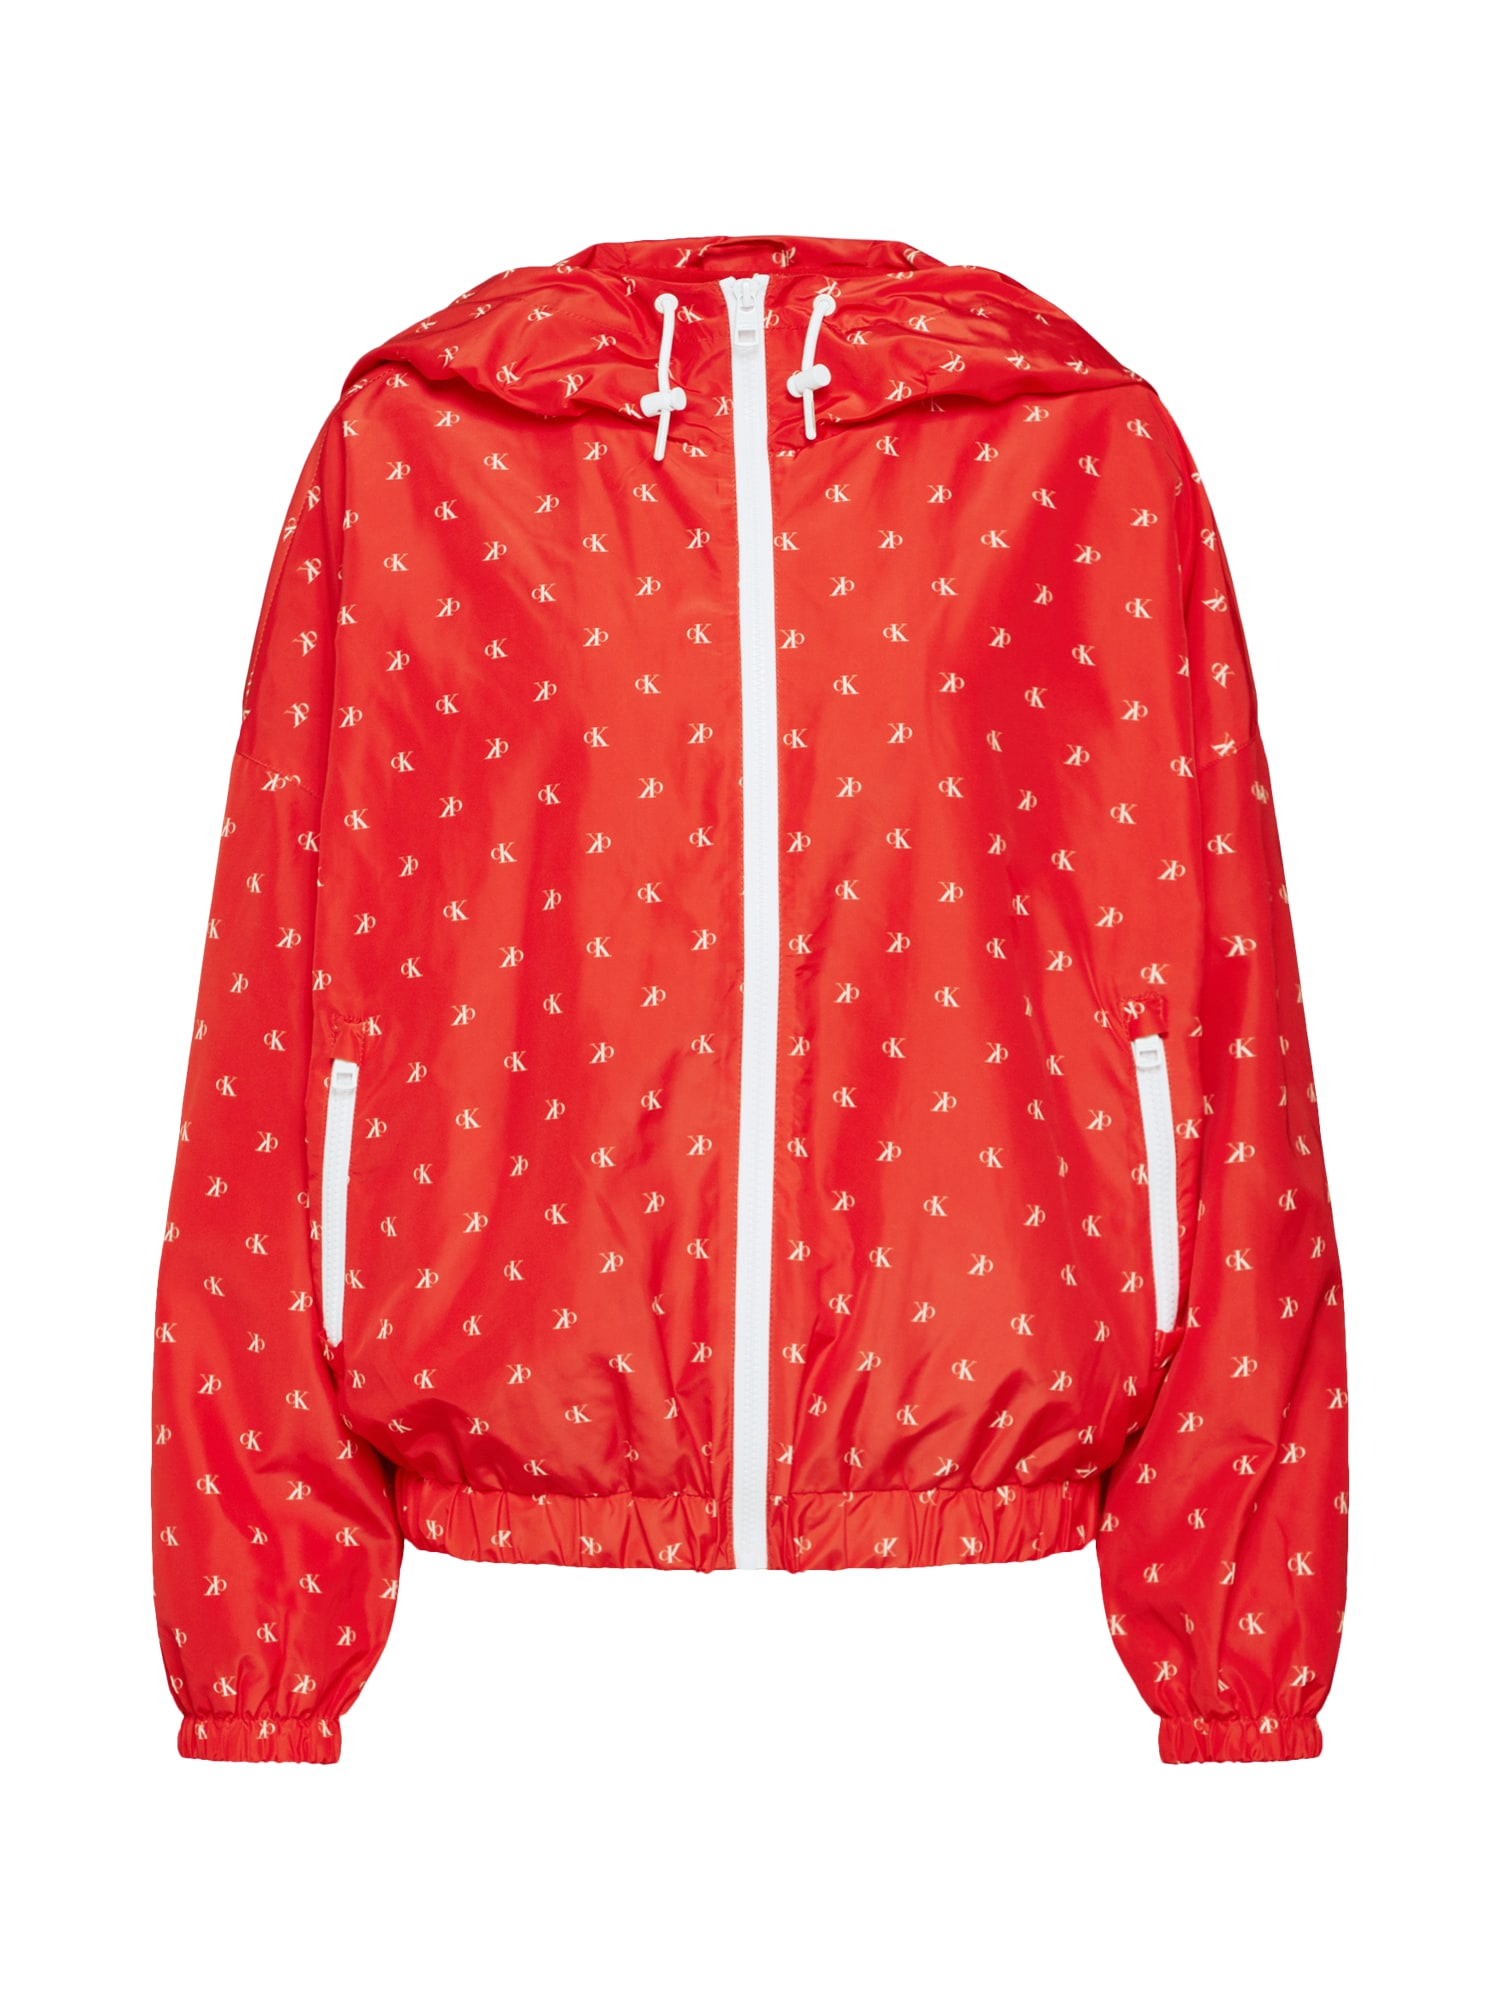 Přechodná bunda MONOGRAM AOP WINDBREAKER červená bílá Calvin Klein Jeans